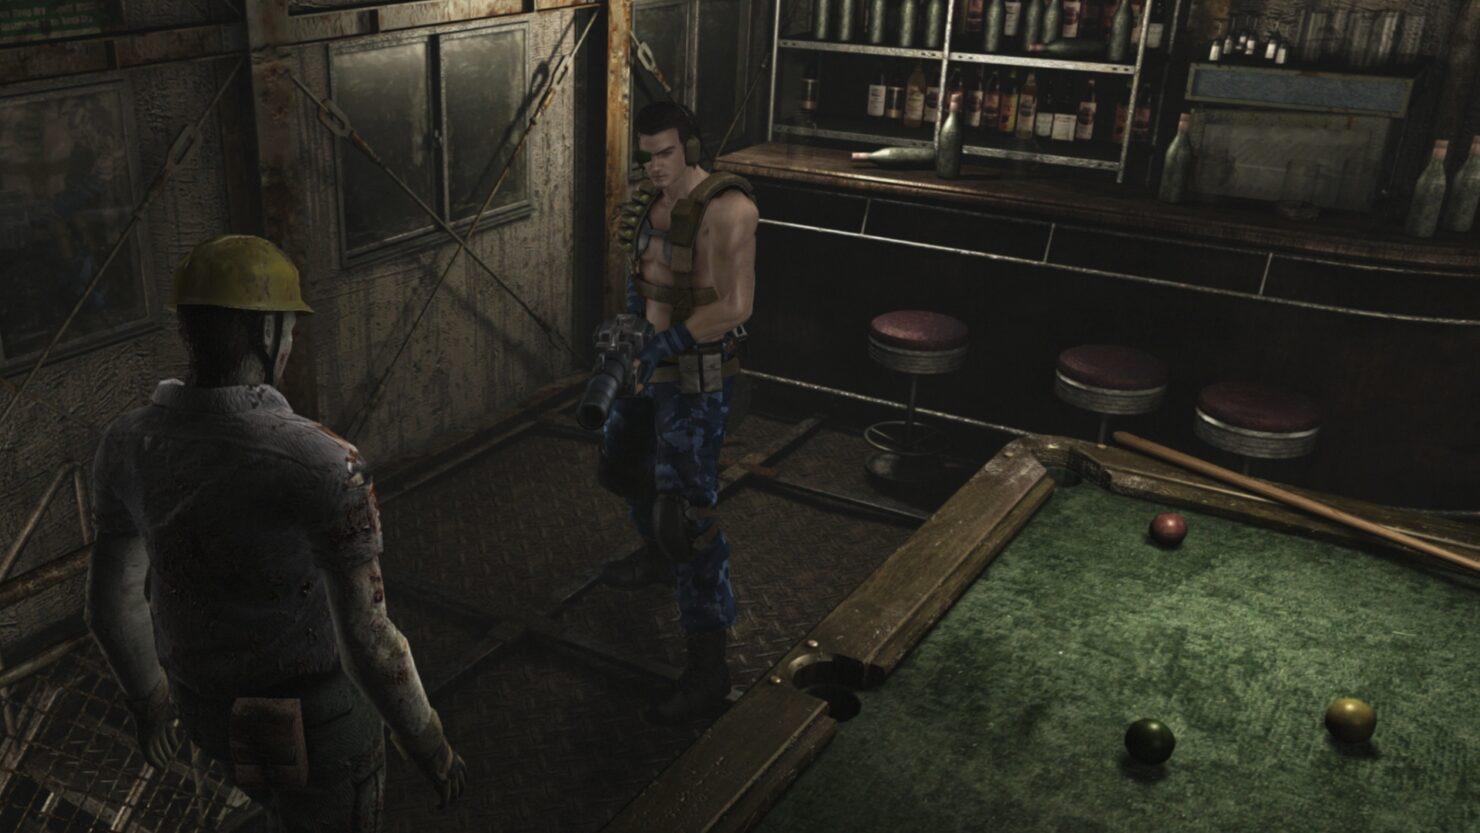 resident-evil-0-hd-release-3